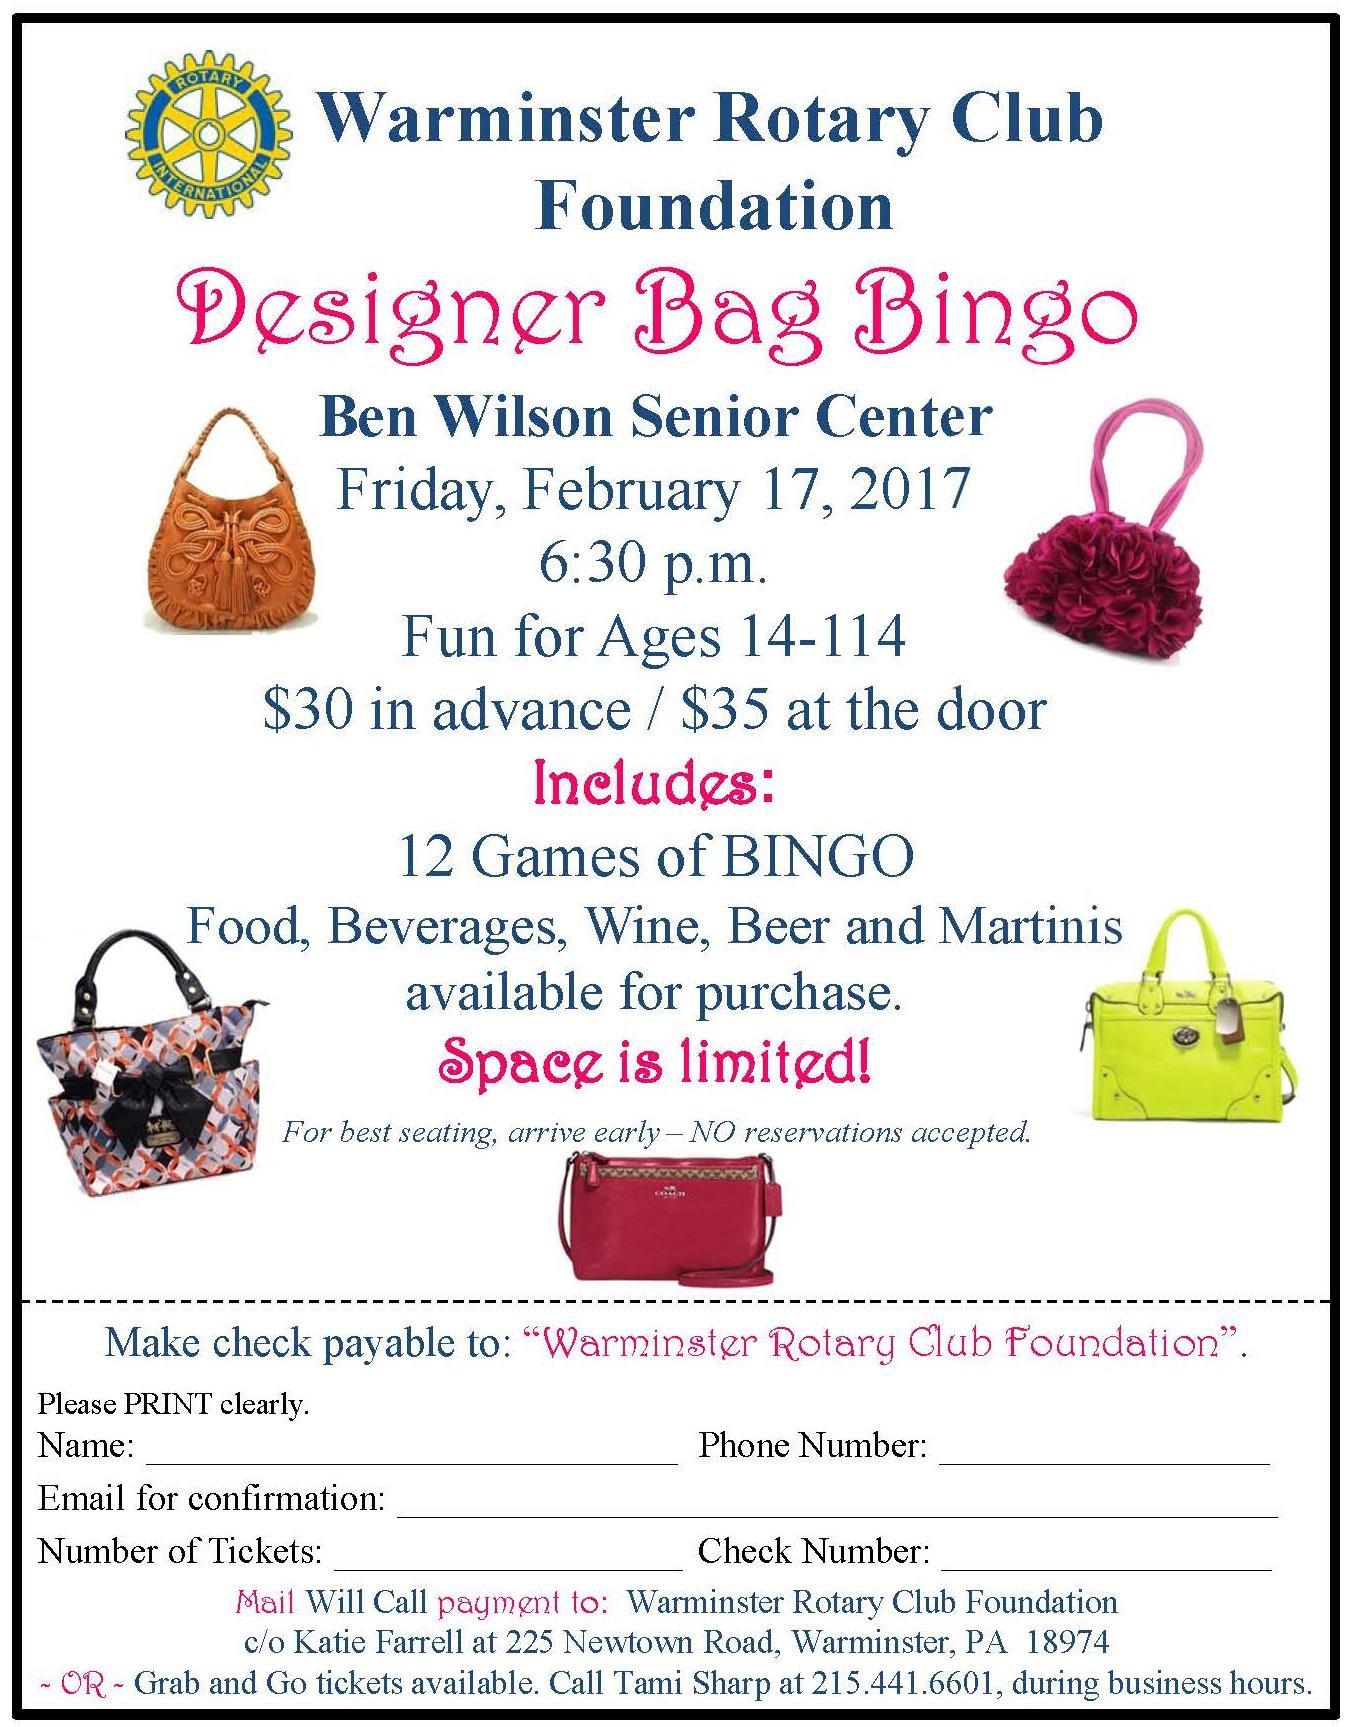 Designer Bag Bingo Feb 17 2017 Rotary Club Of Warminster